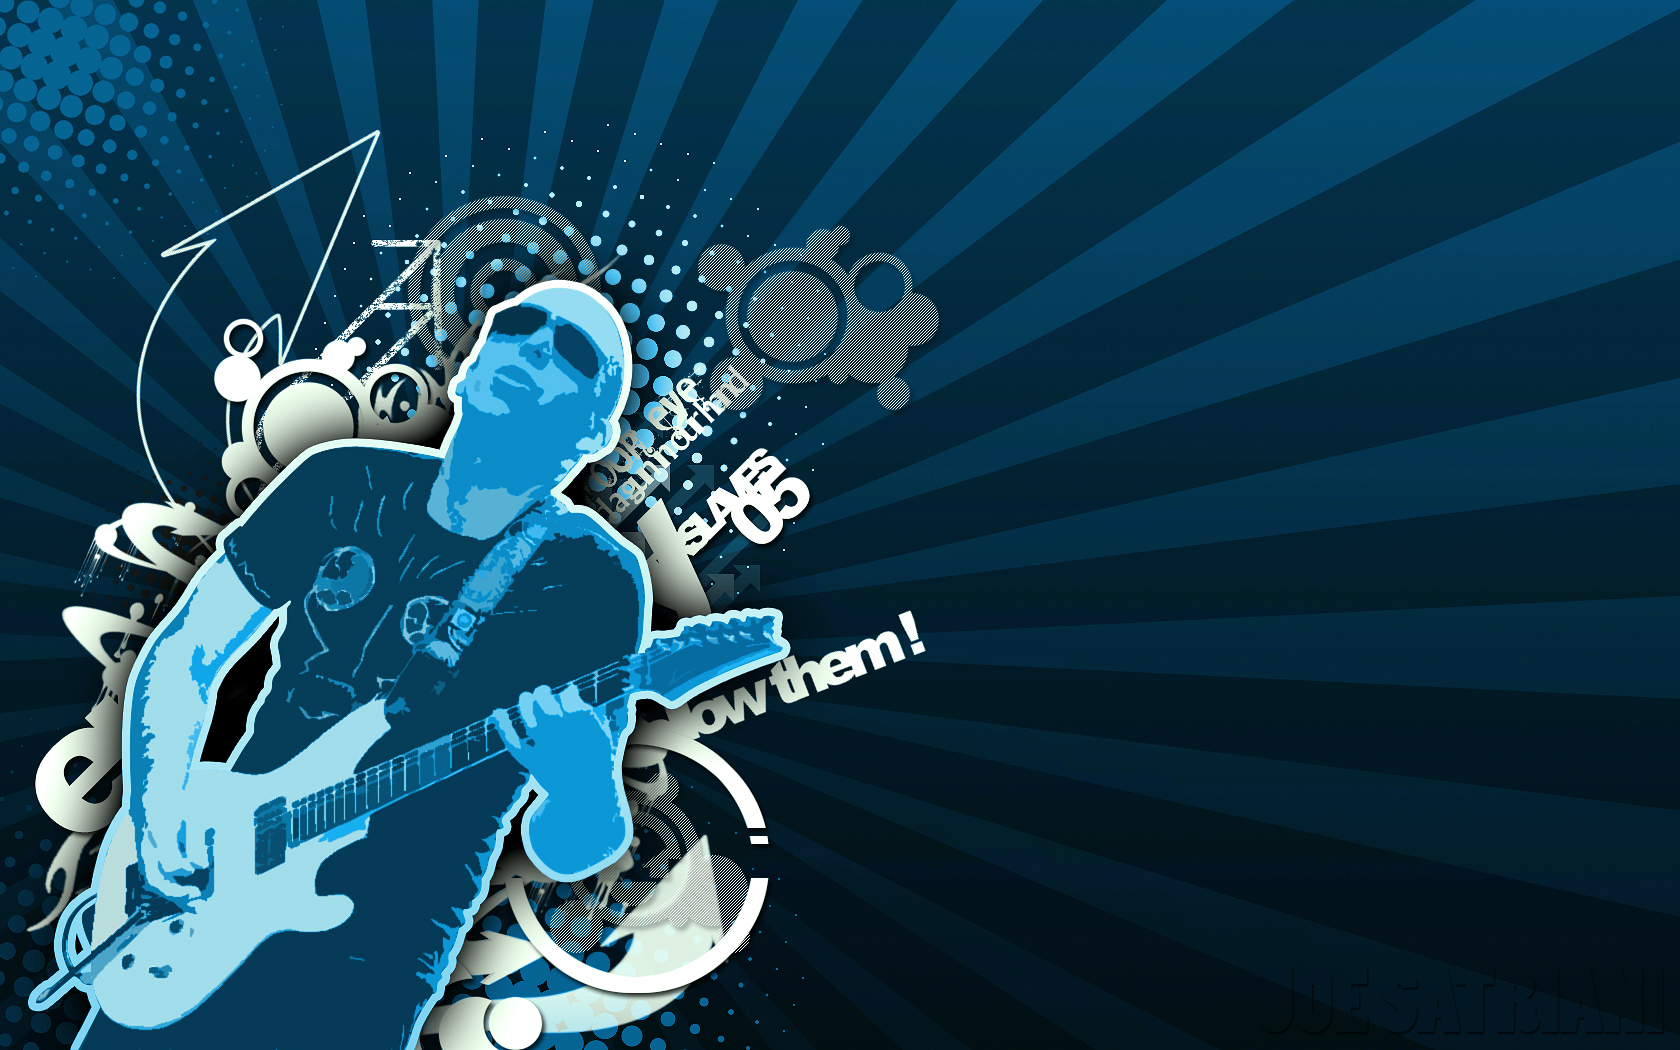 Music   Joe Satriani Wallpaper 1680x1050